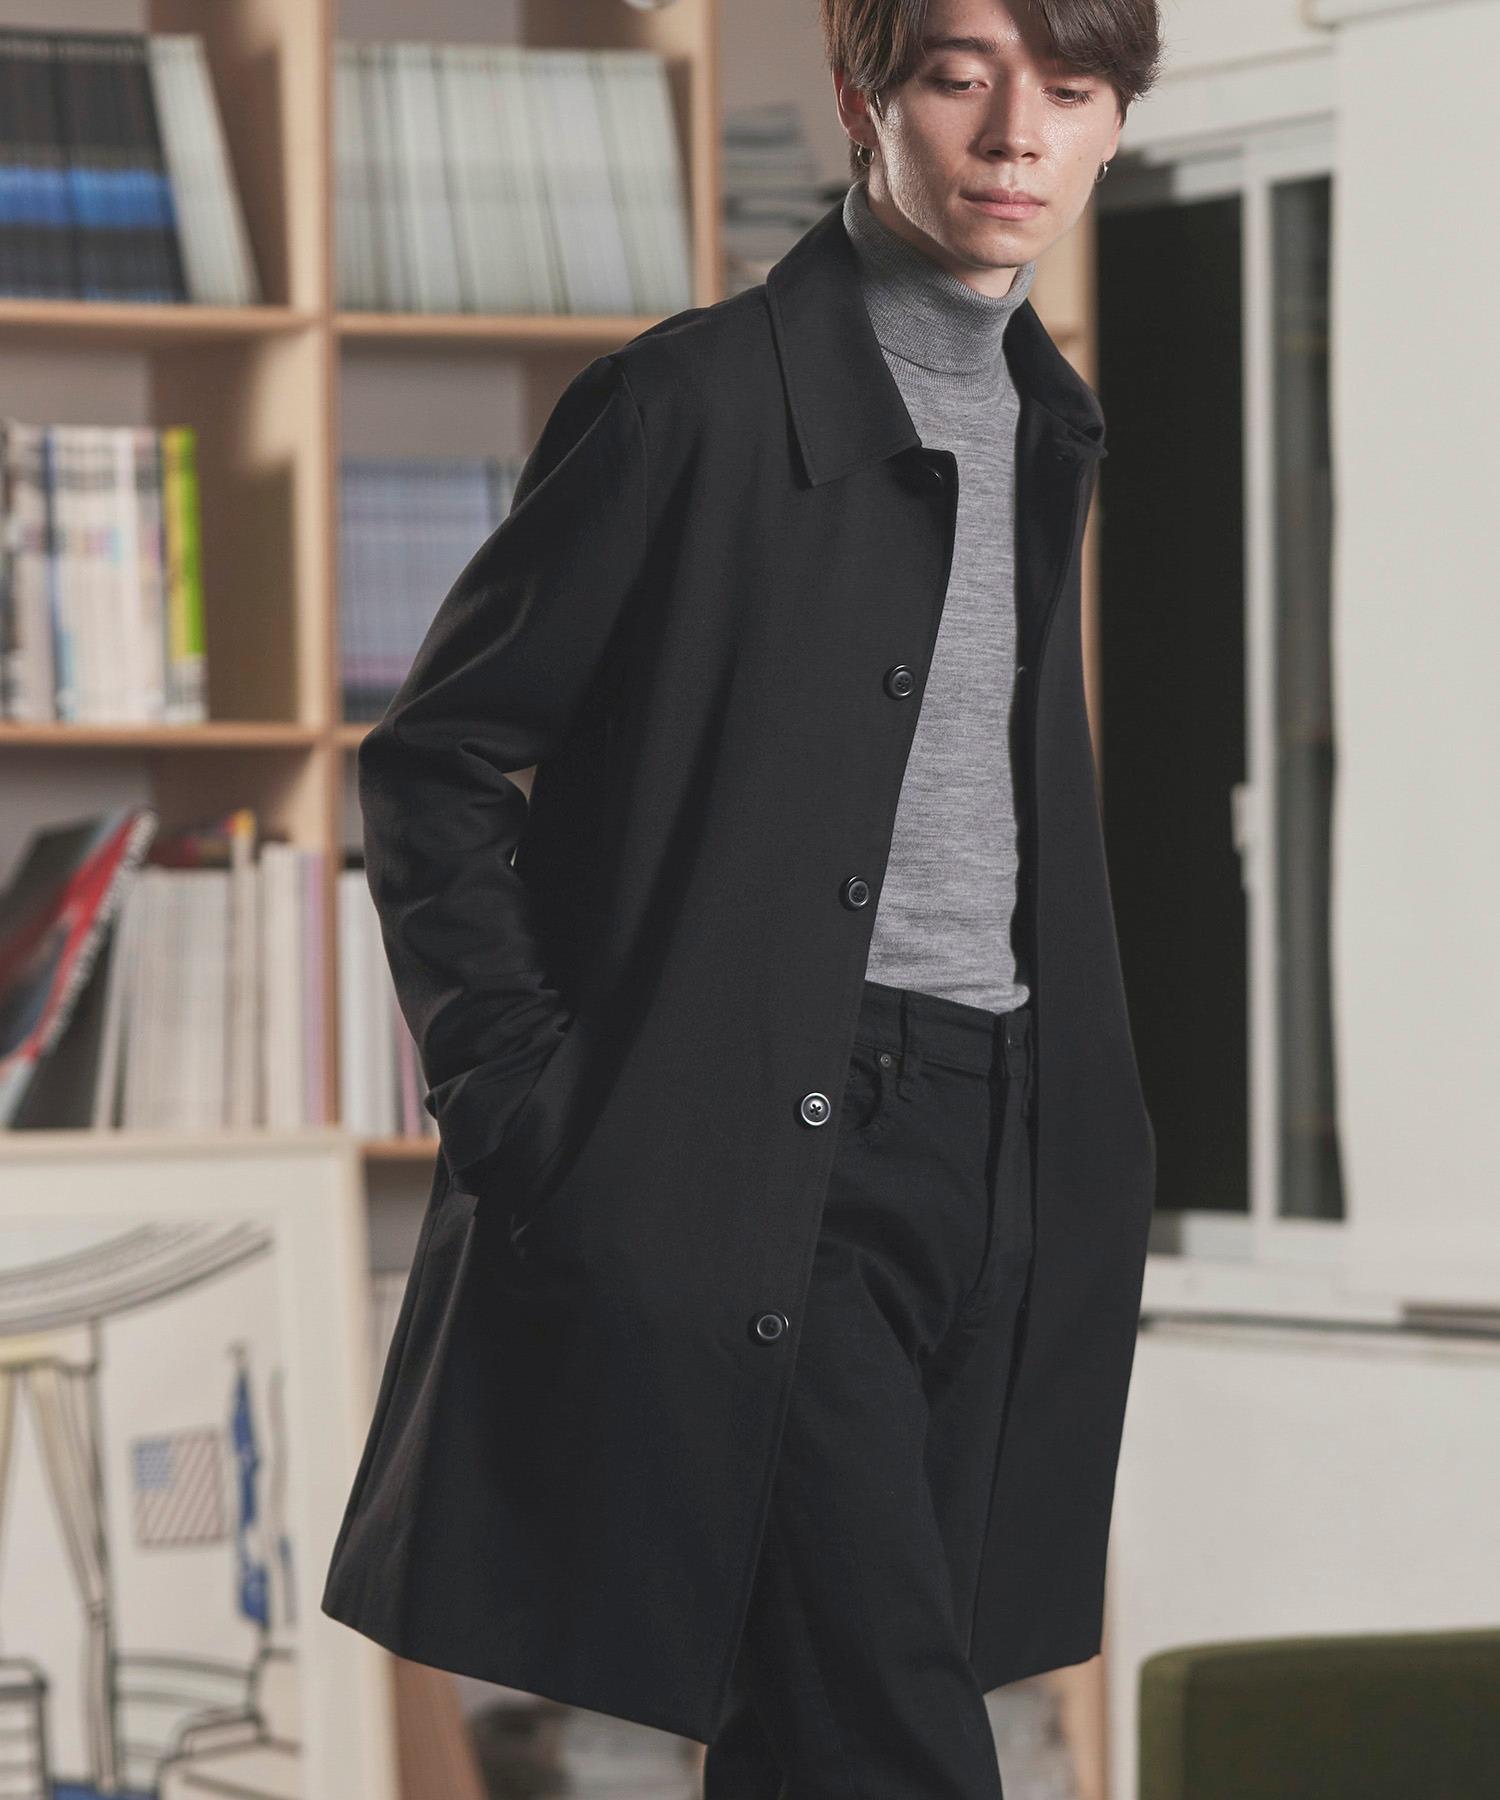 TRストレッチスーツ地ステンカラーコート